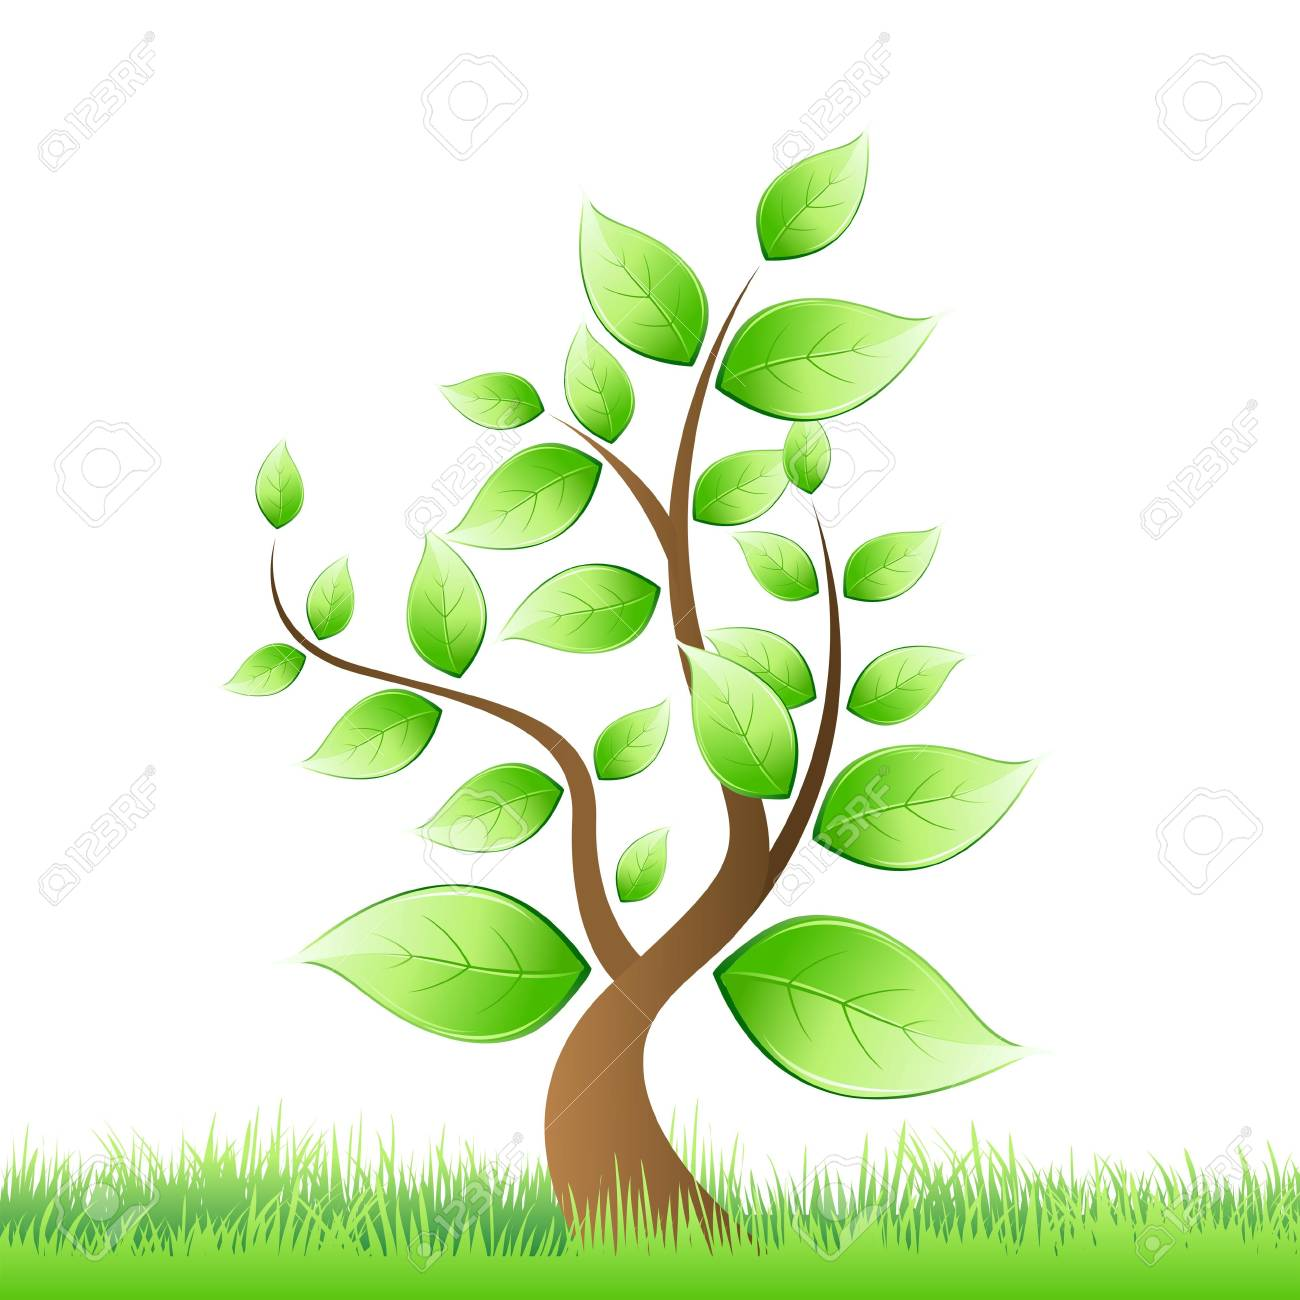 illustration of  tree growing in grass Stock Illustration - 7714926